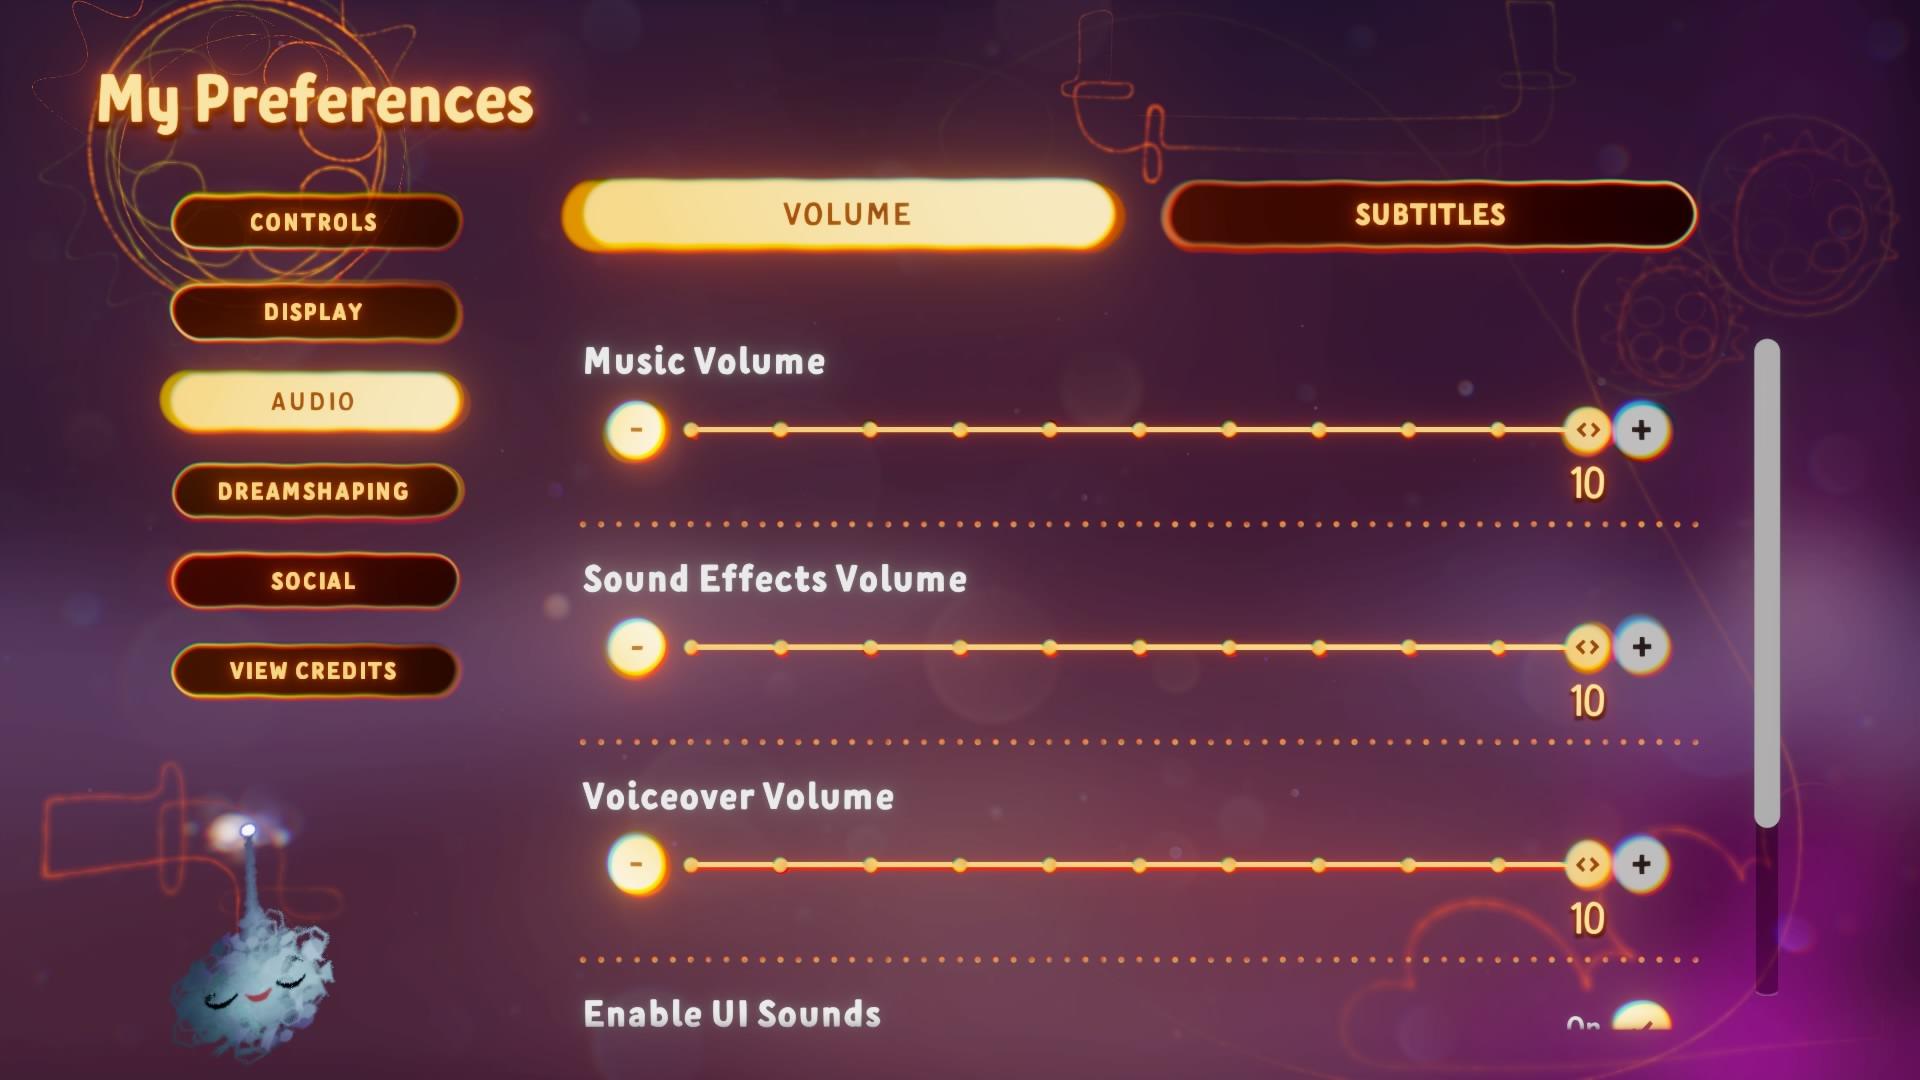 Screenshot showing Volume Sliders in the Preferences Menu